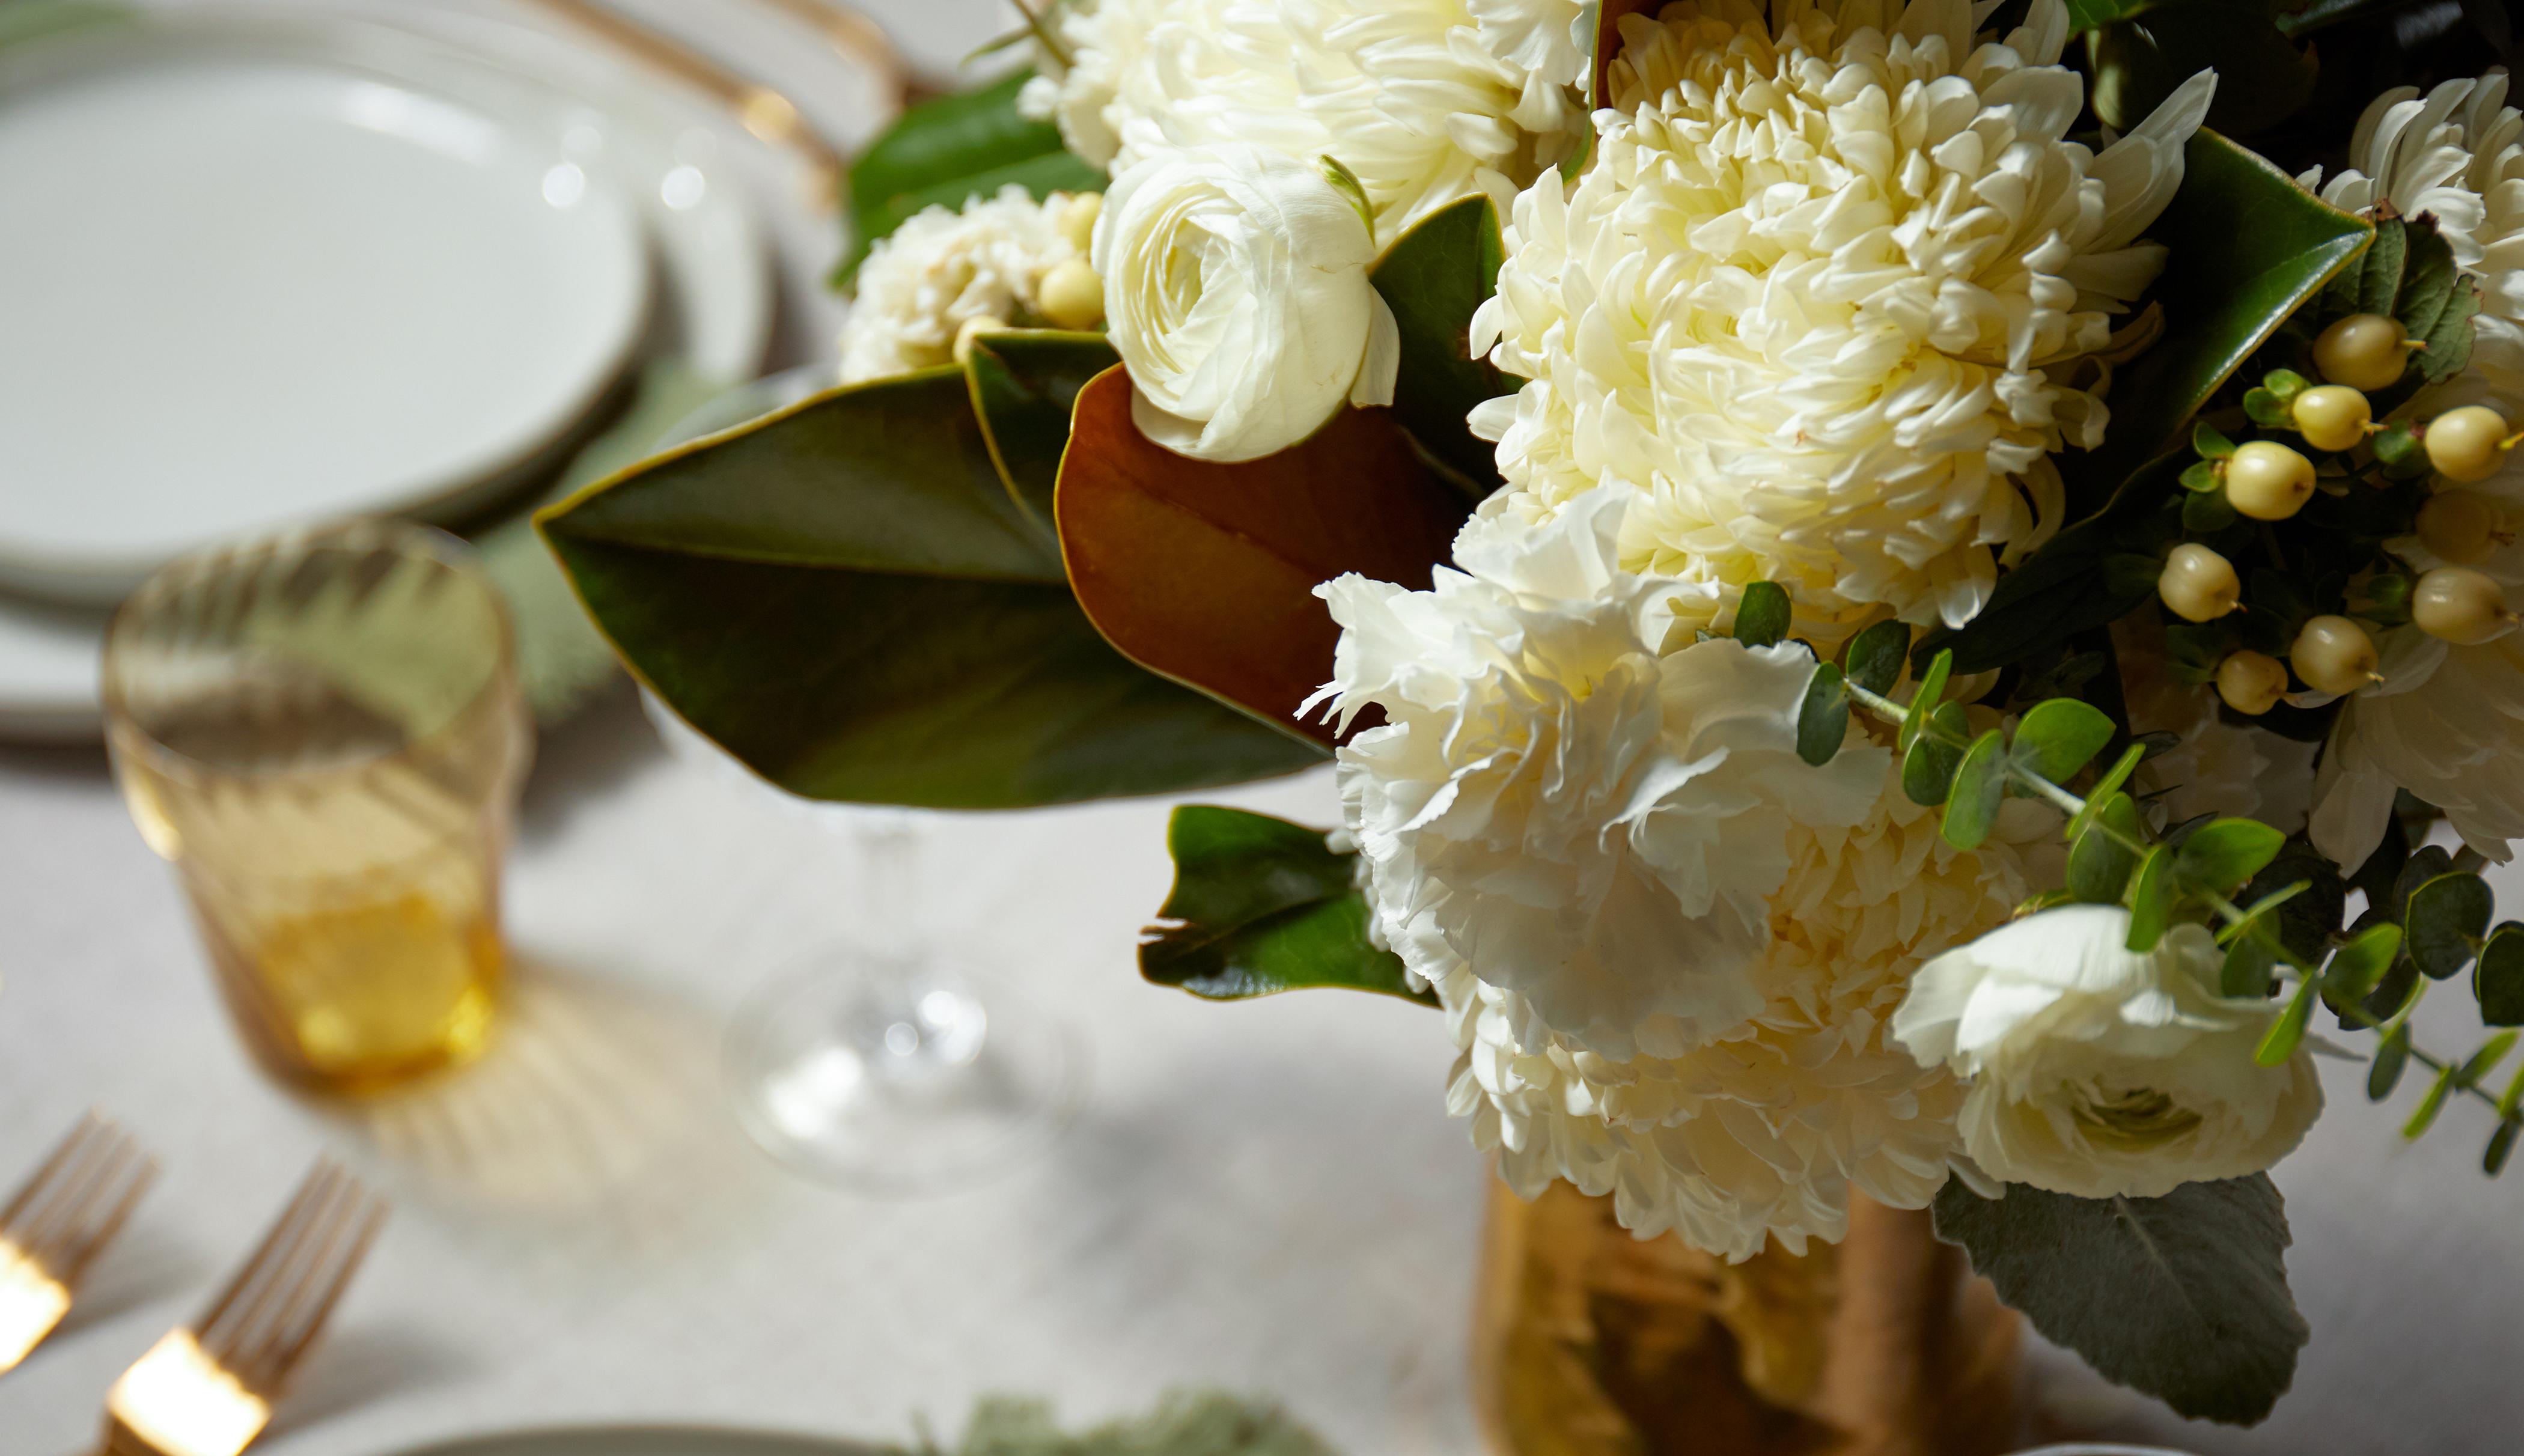 Magnolia bouquet on a set table